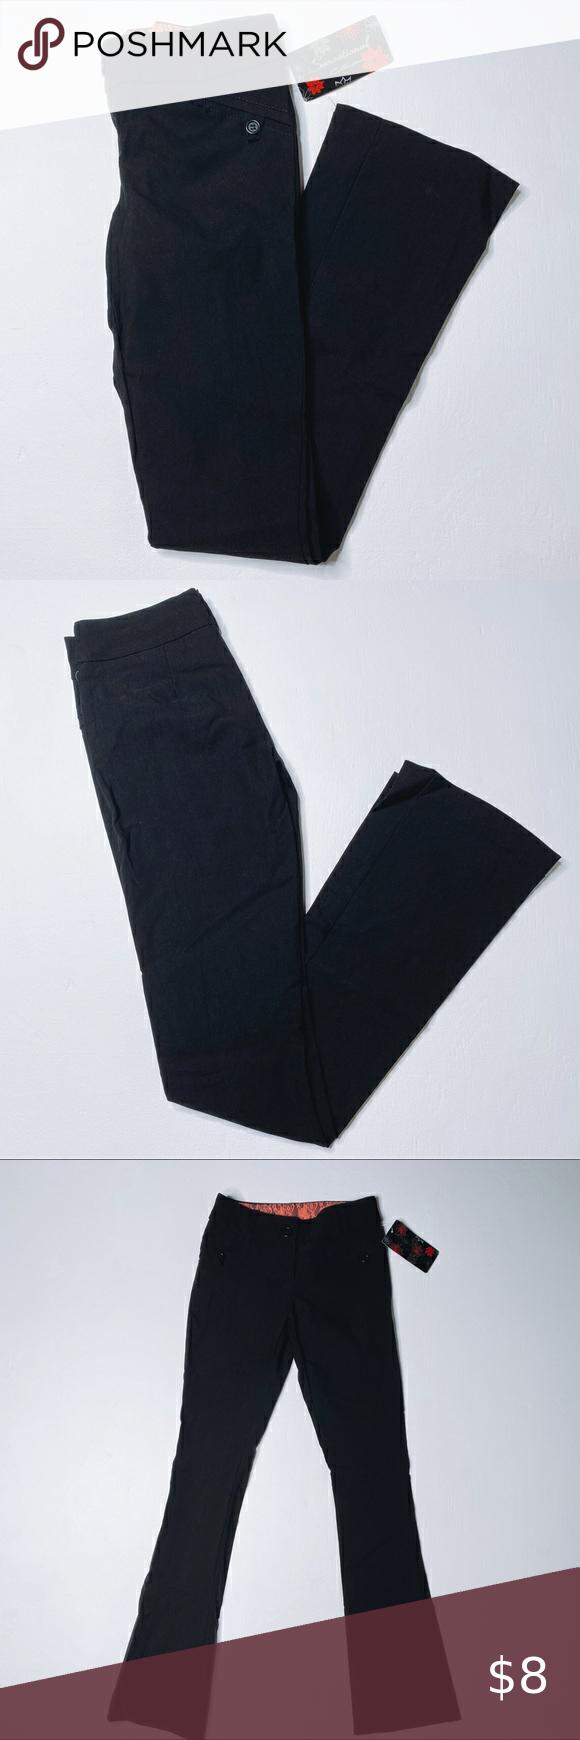 Sensational Collection Black Bootcut Dress Pant Dress Pant Pants For Women Pants [ 1740 x 580 Pixel ]